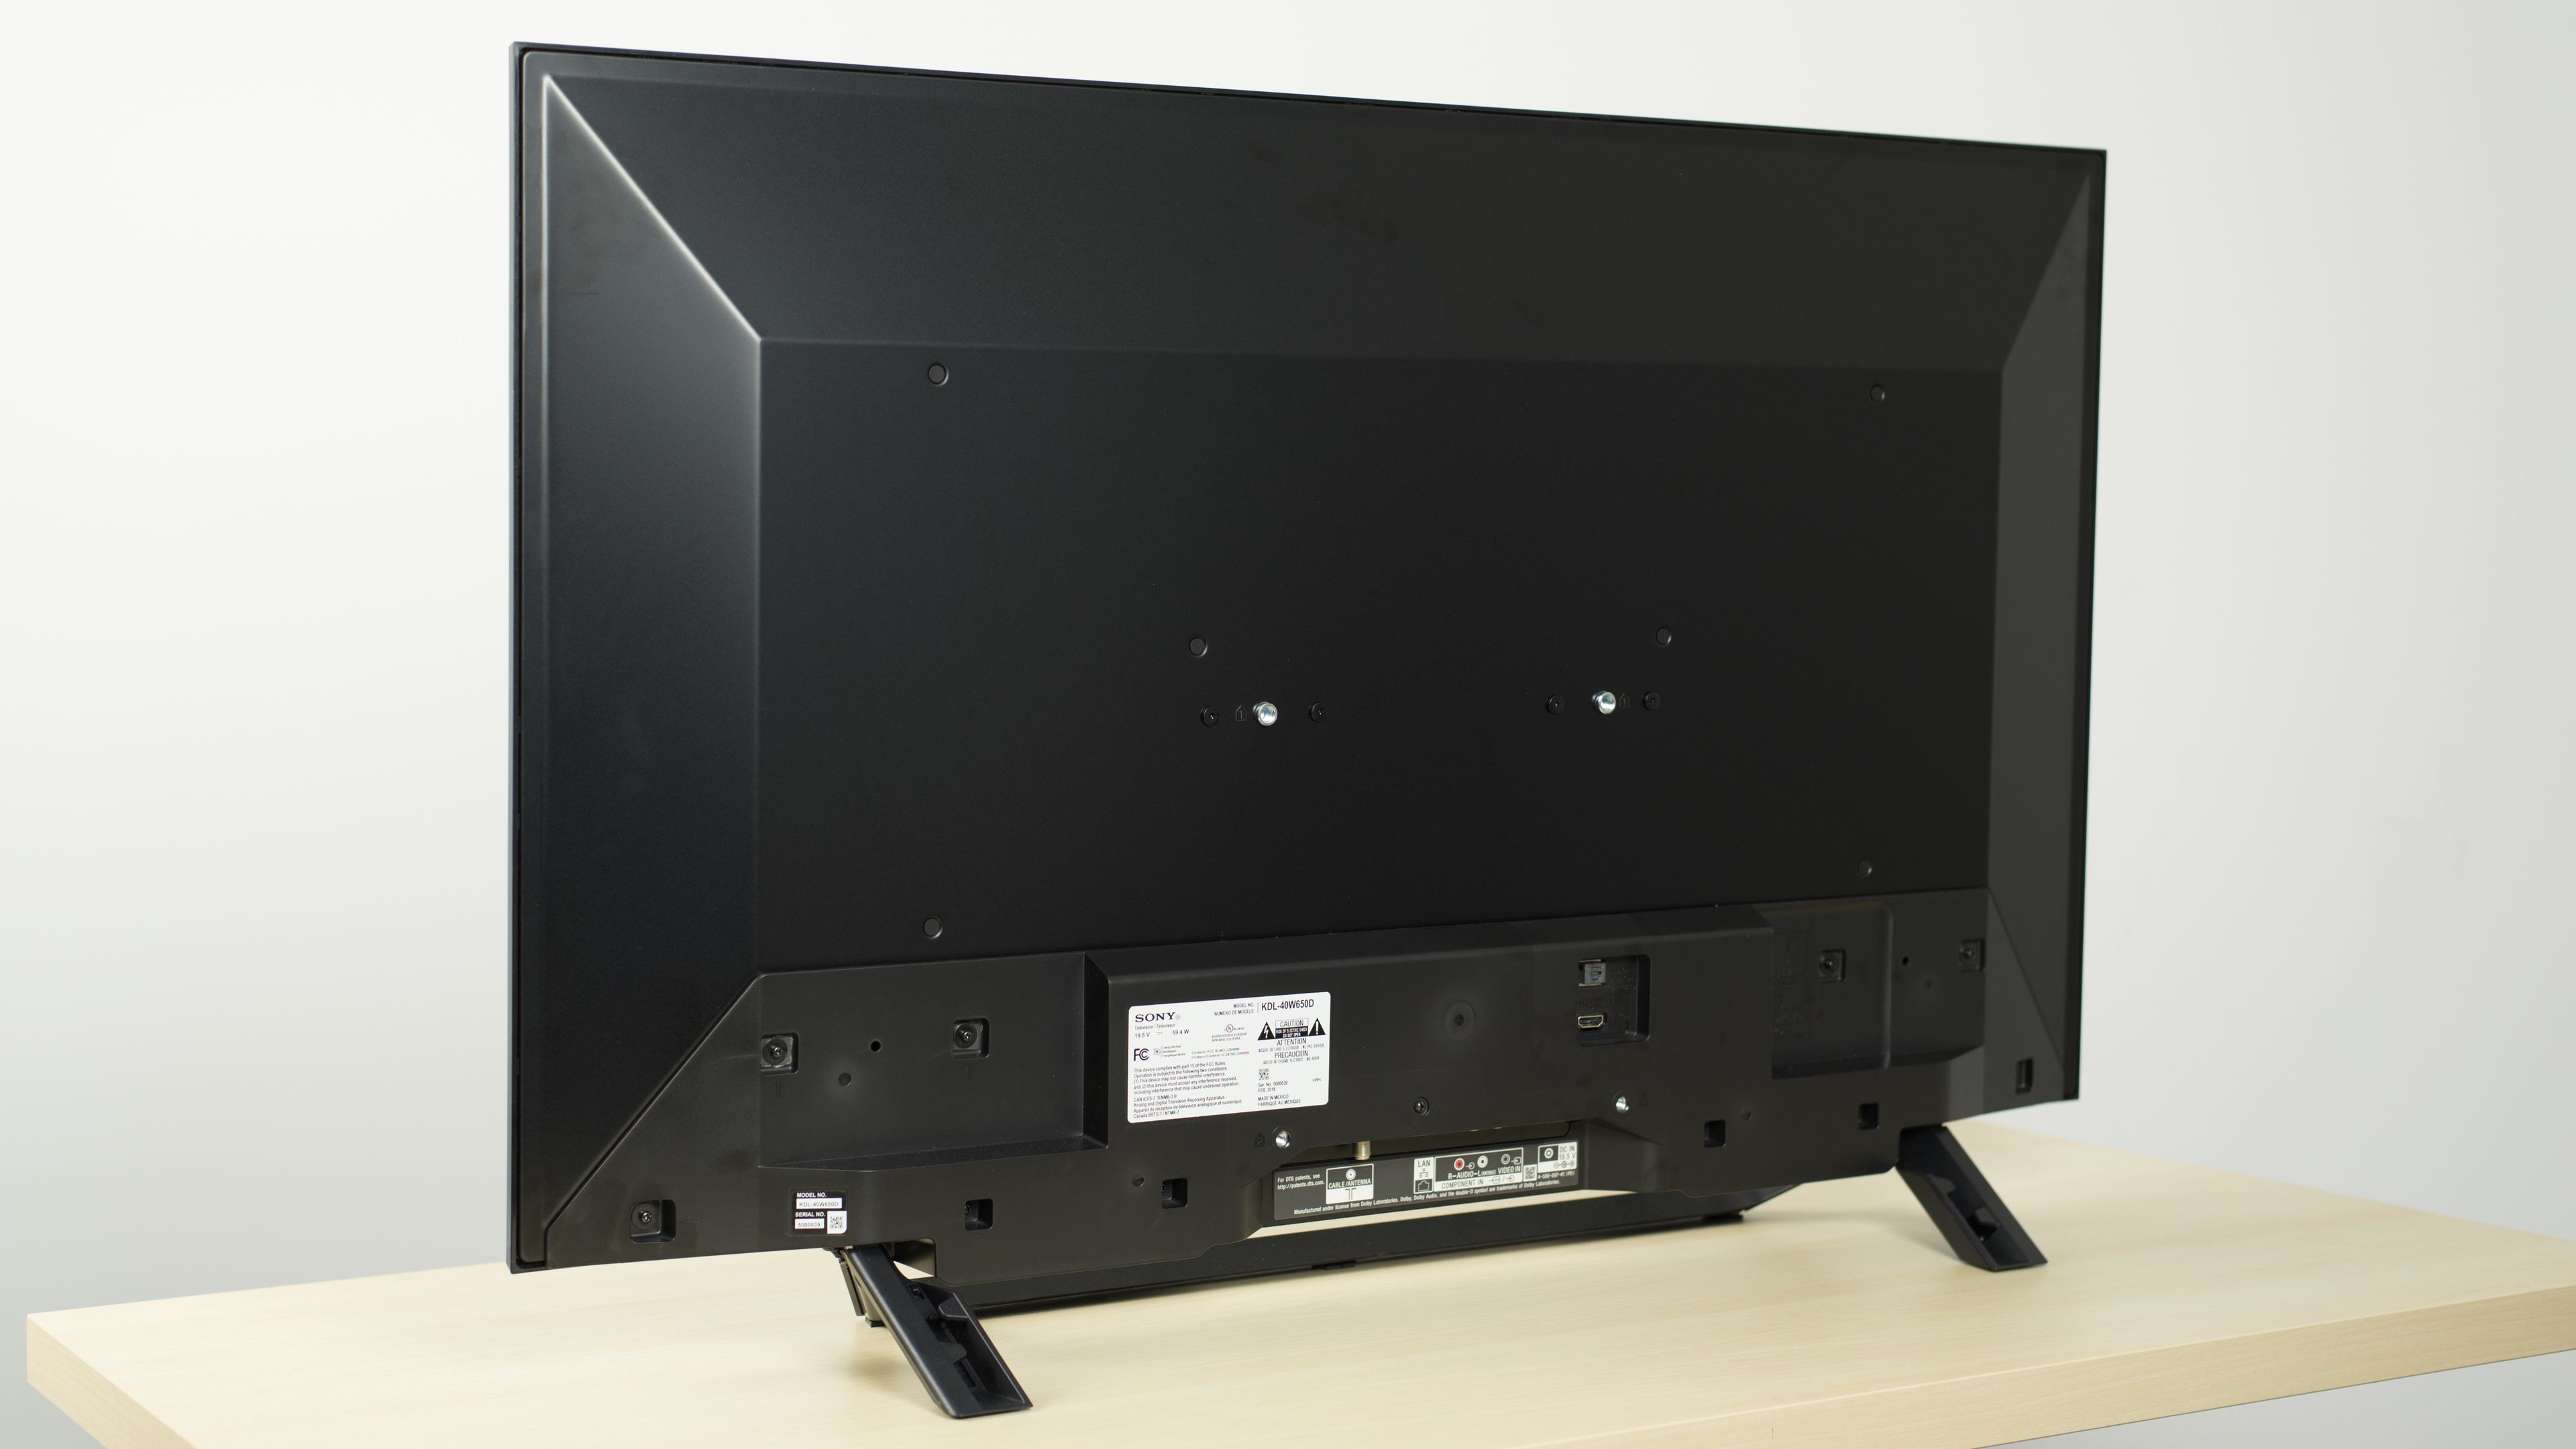 Sony W650d Review Kdl40w650d Kdl48w650d Kdl55w650d Rtings Com